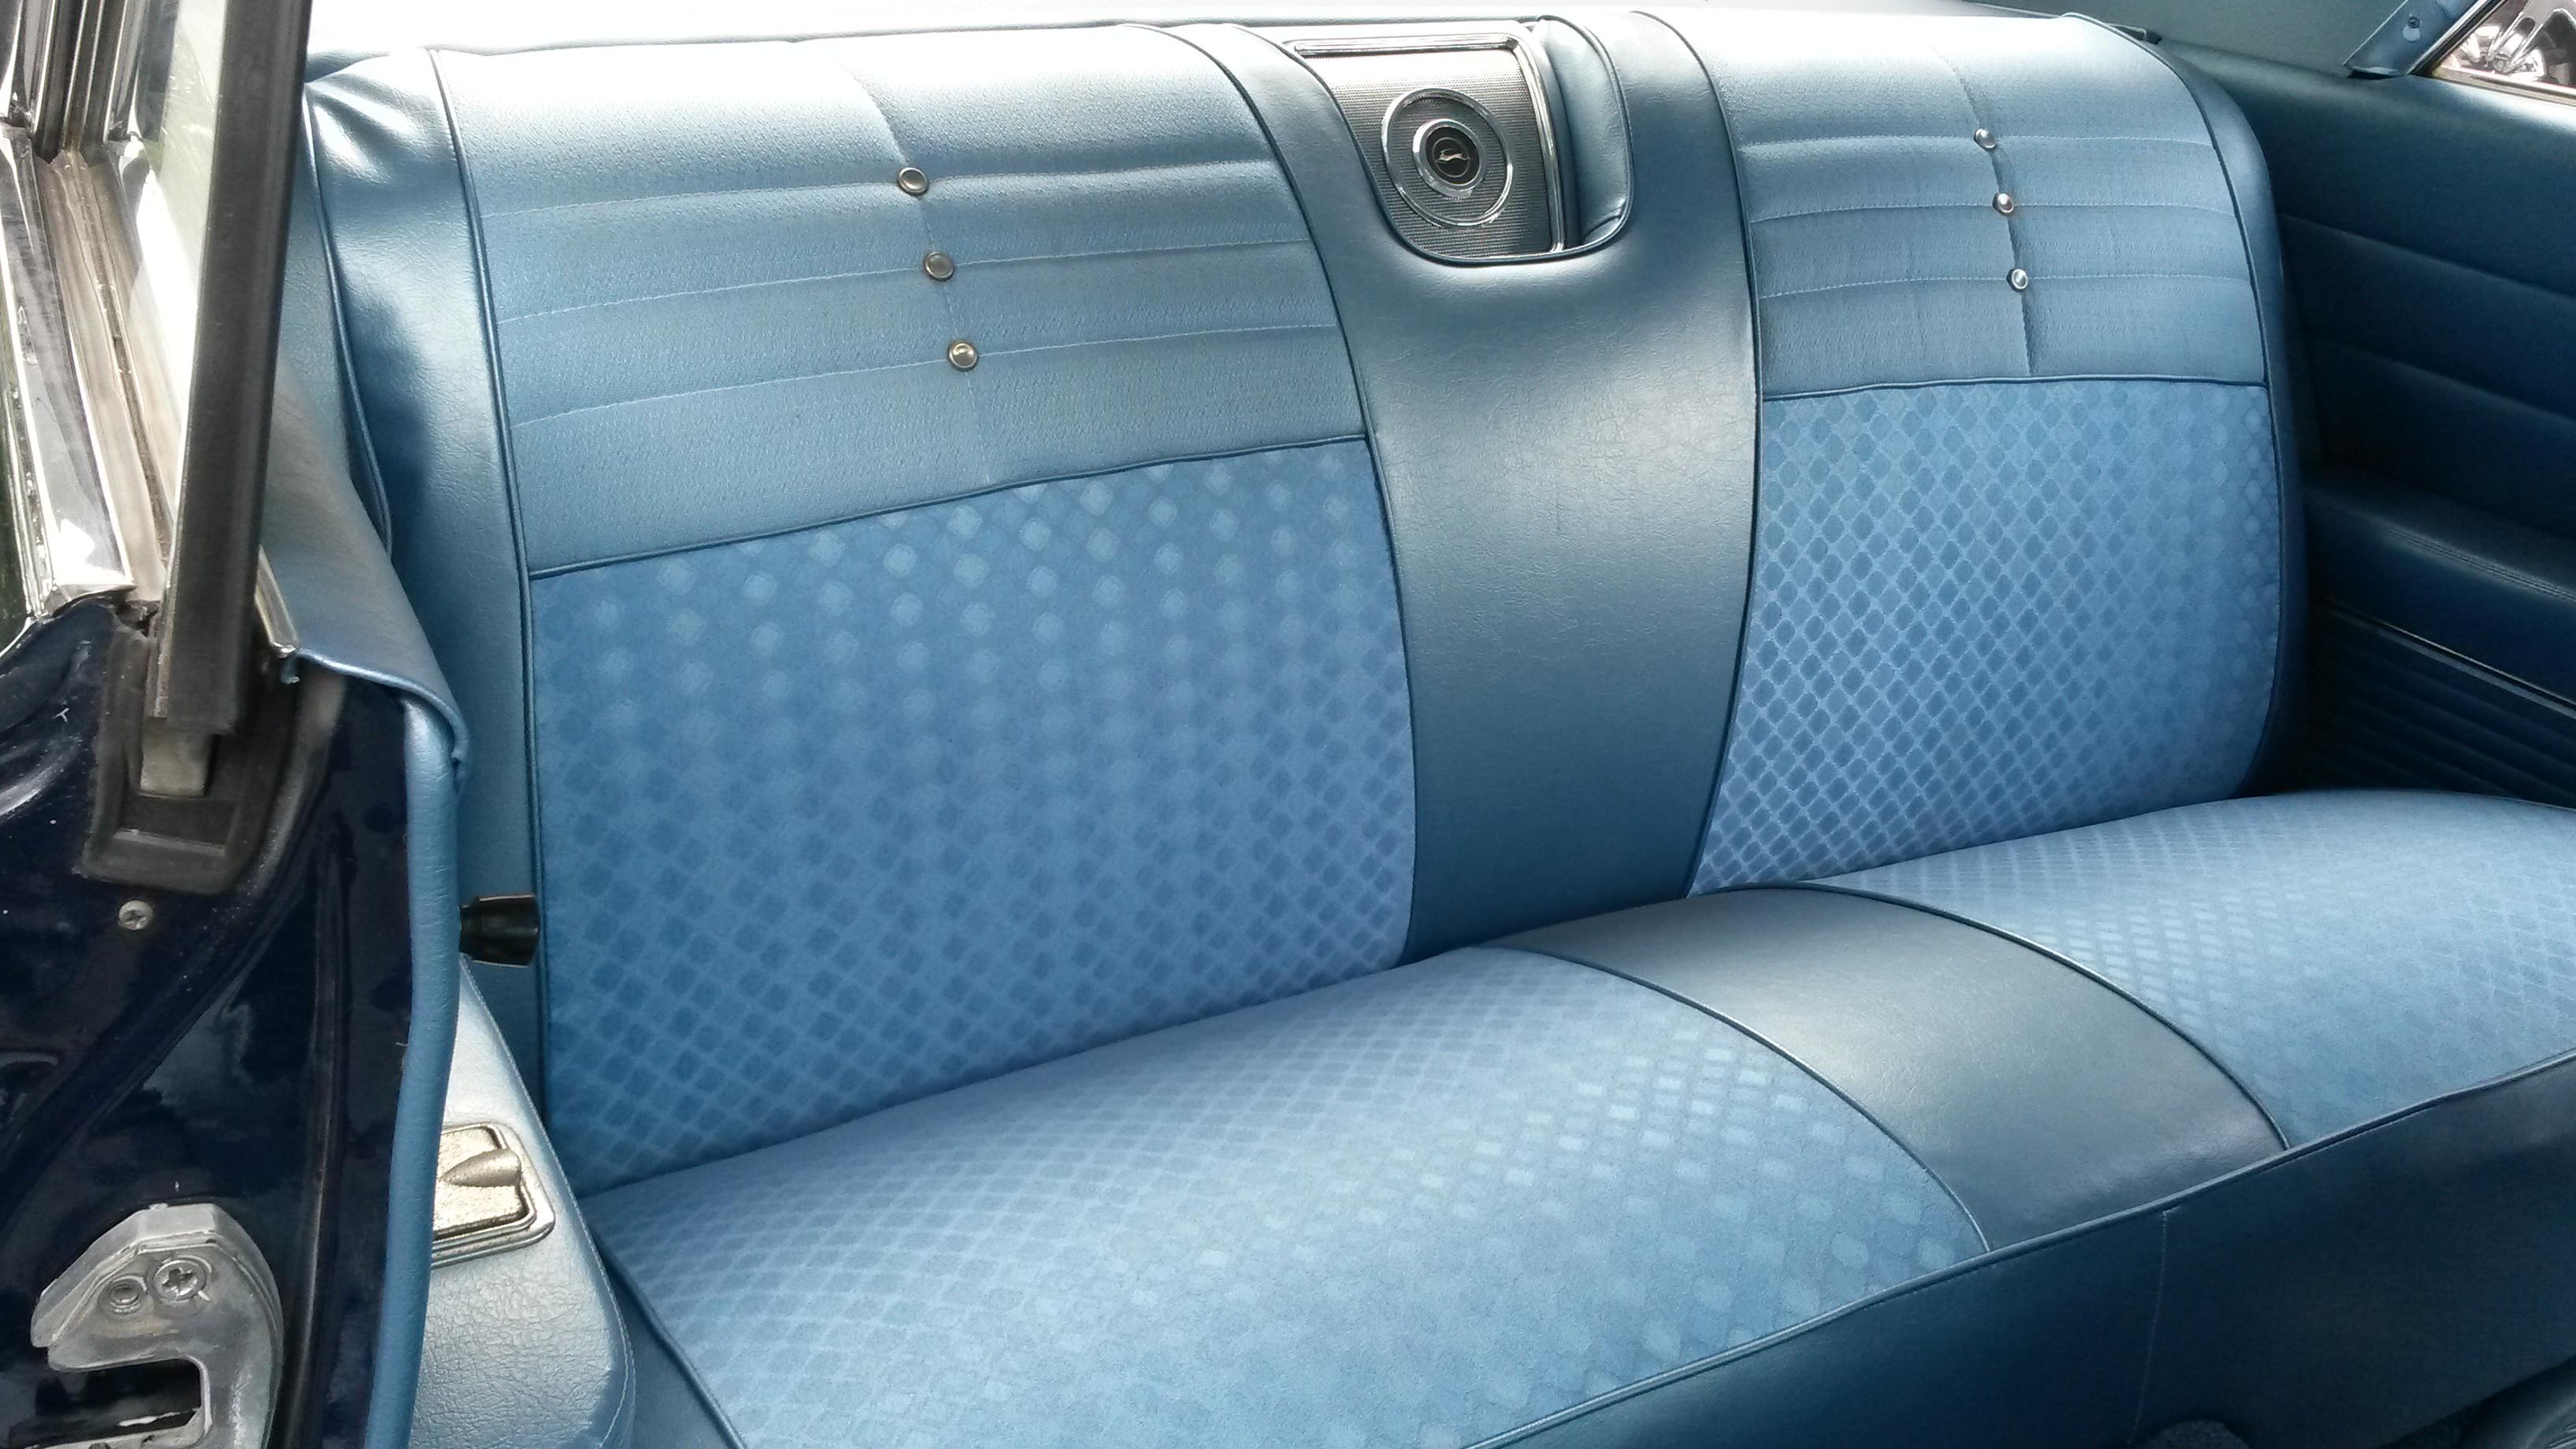 1964 Impala Two Door Hardtop (21)